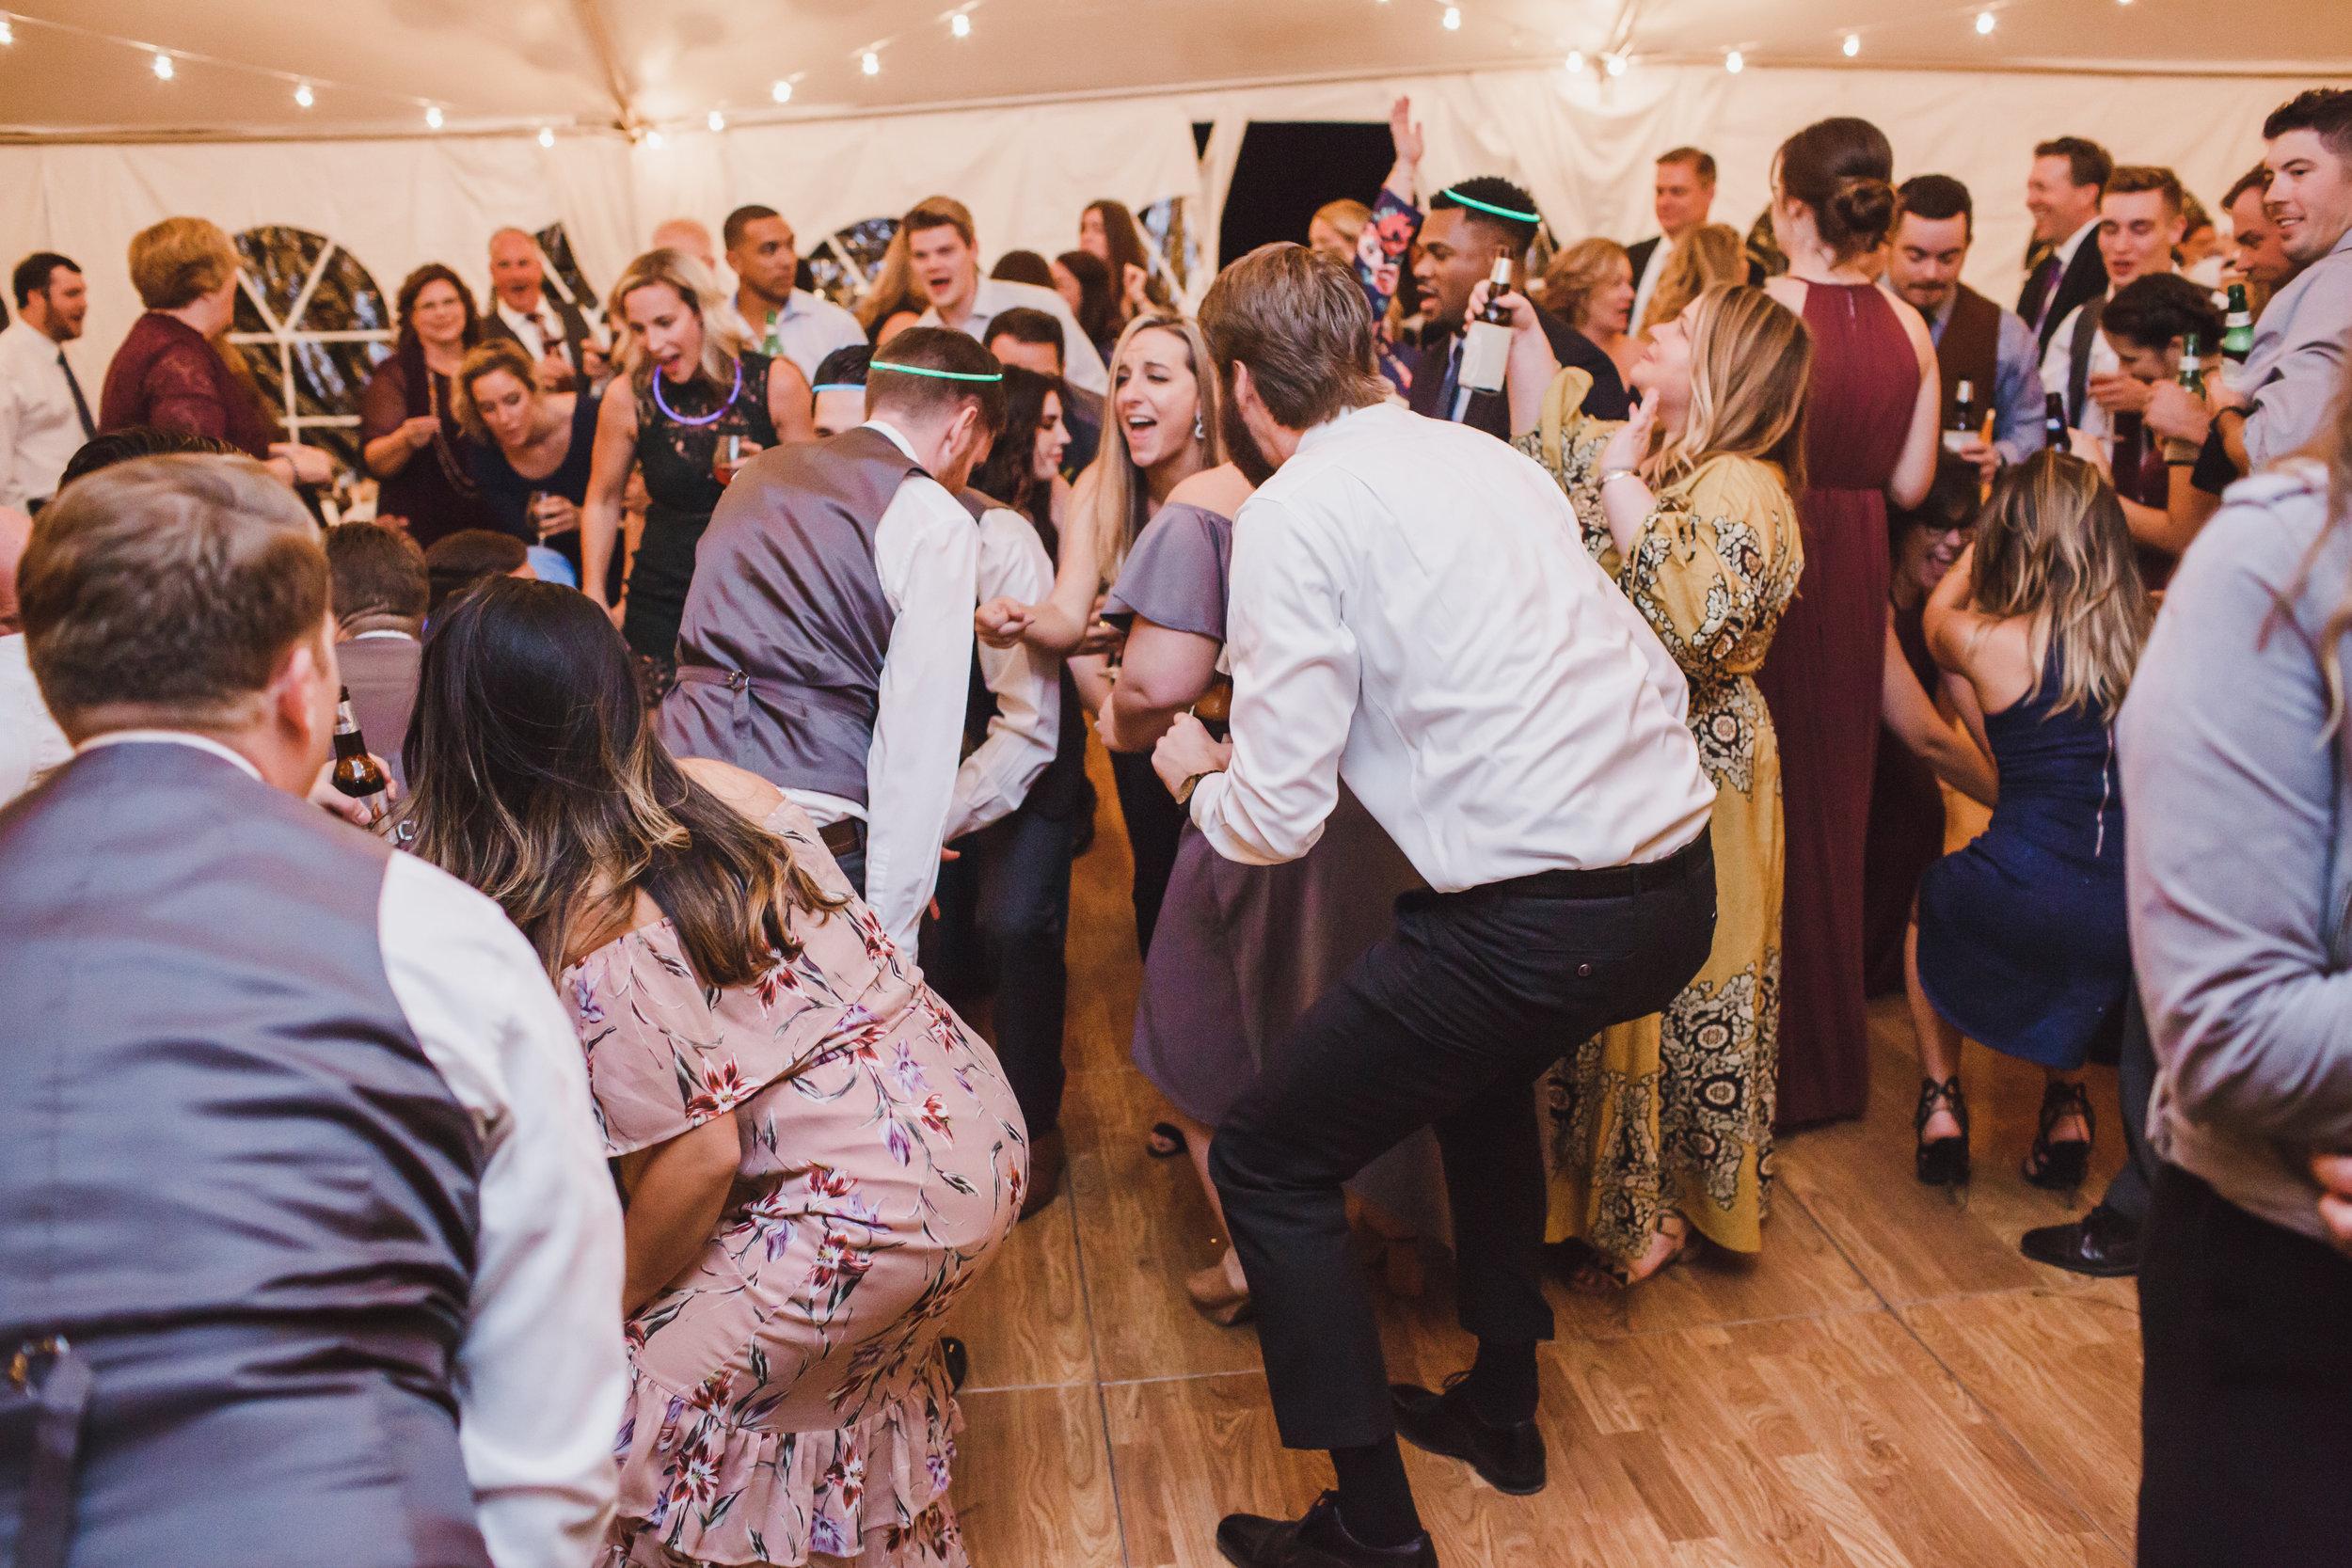 Fling - Virginia Wedding Photographer - Photography by Amy Nicole-996-10.jpg